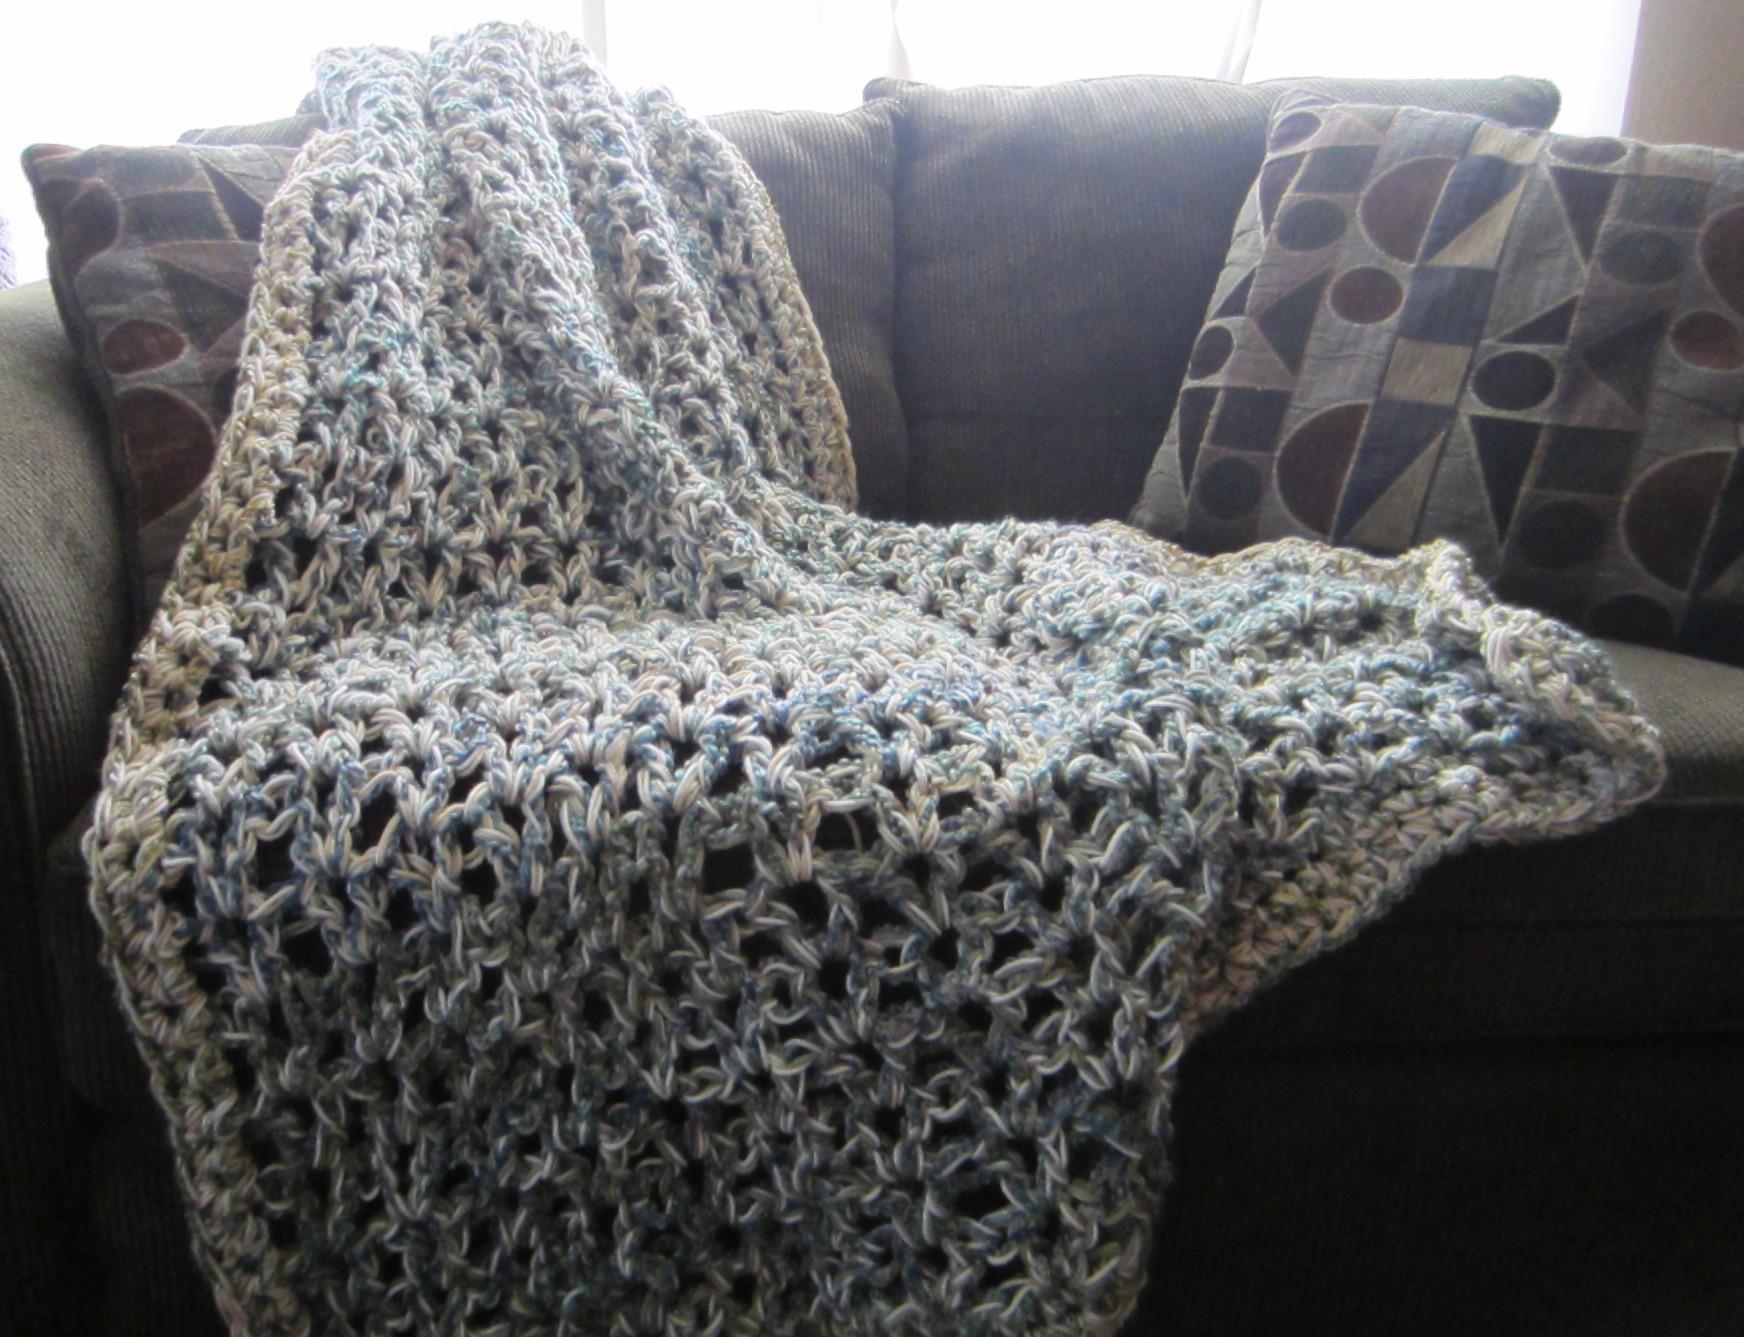 Finished Destash Project Crochet Throw G Ma Ellens Hands